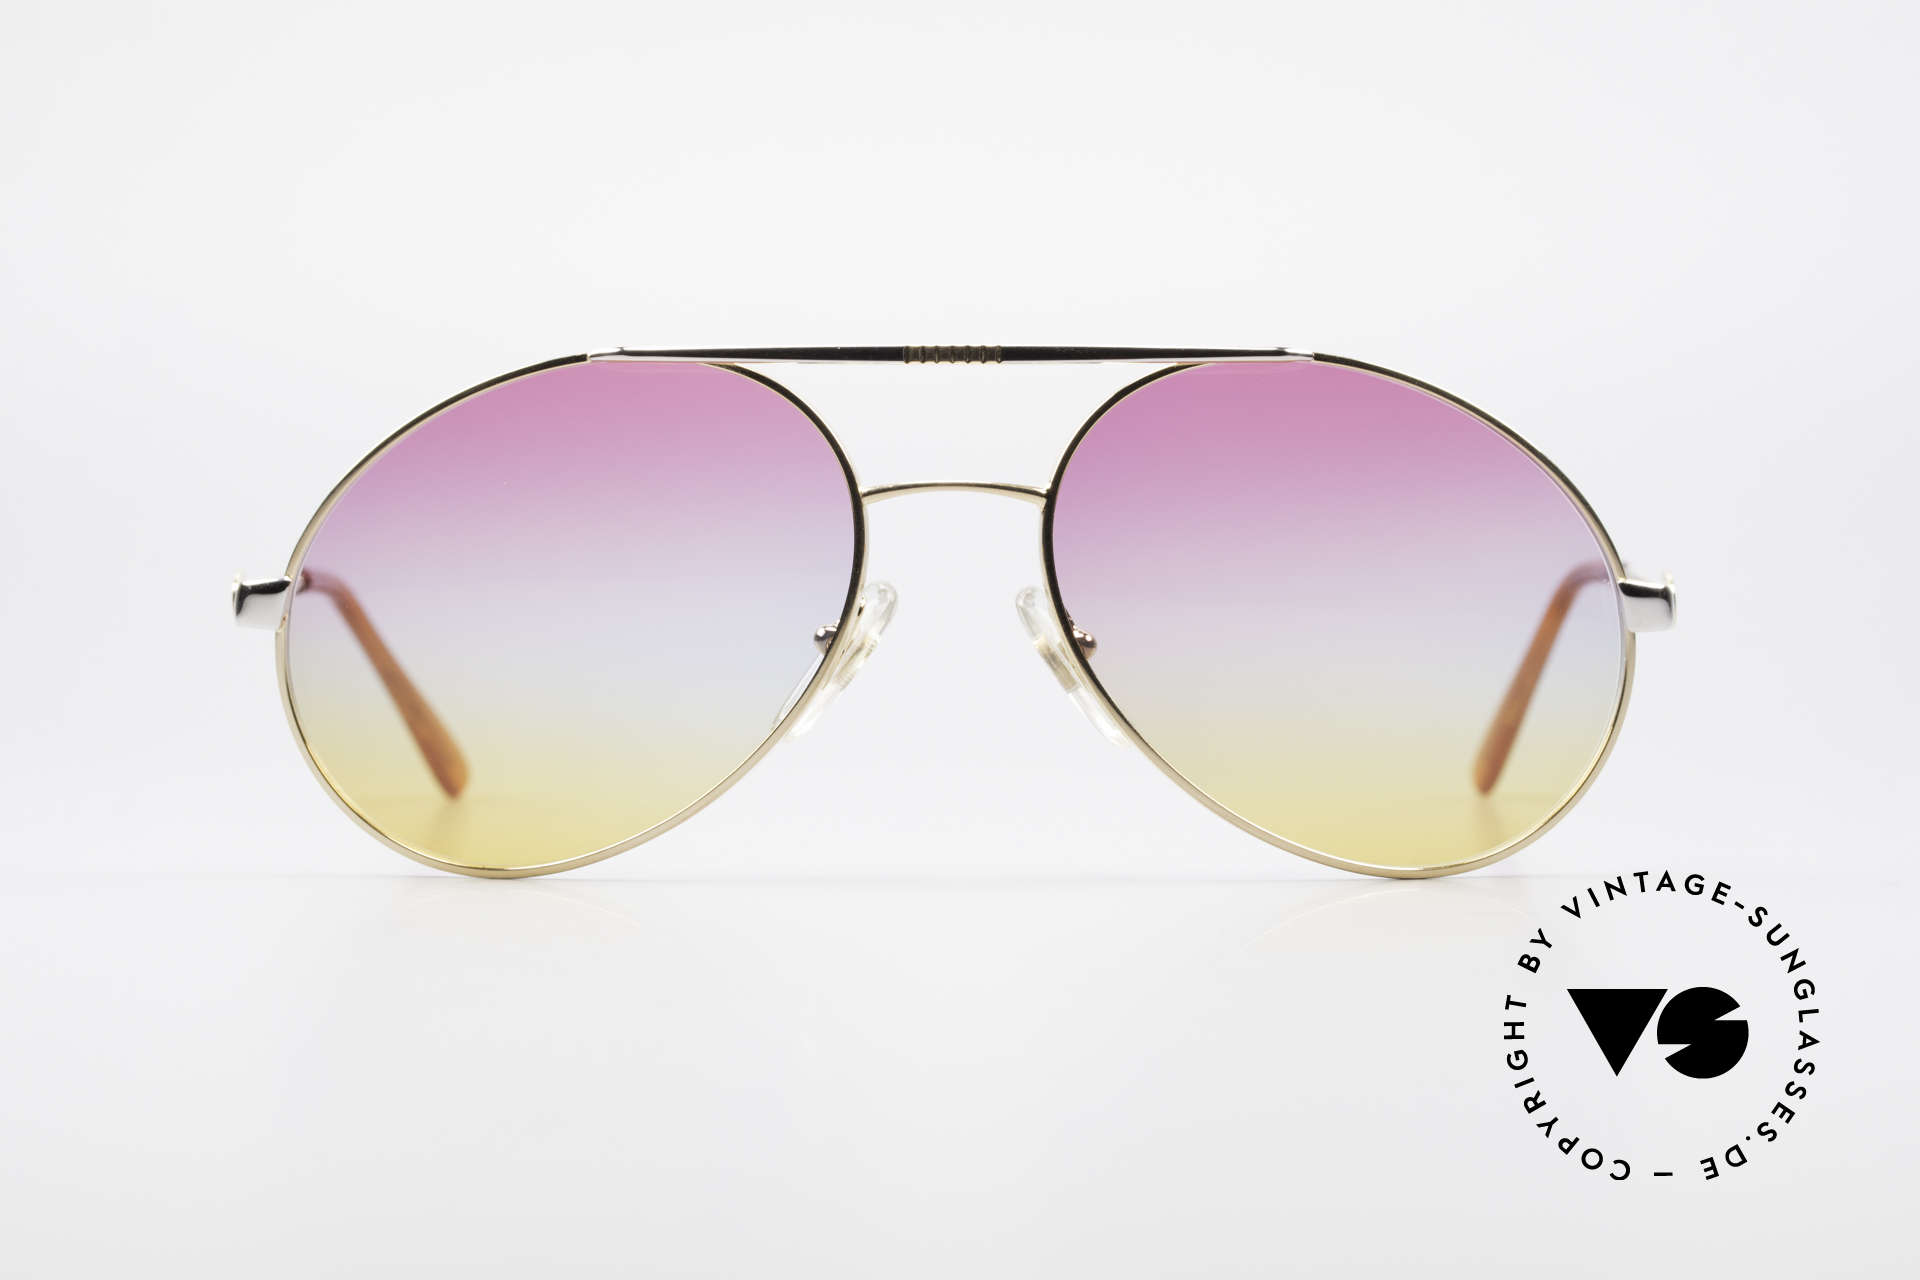 Bugatti 64320 Rare 80's Sunglasses Vintage, legendary Bugatti shape in high-end quality, Made for Men